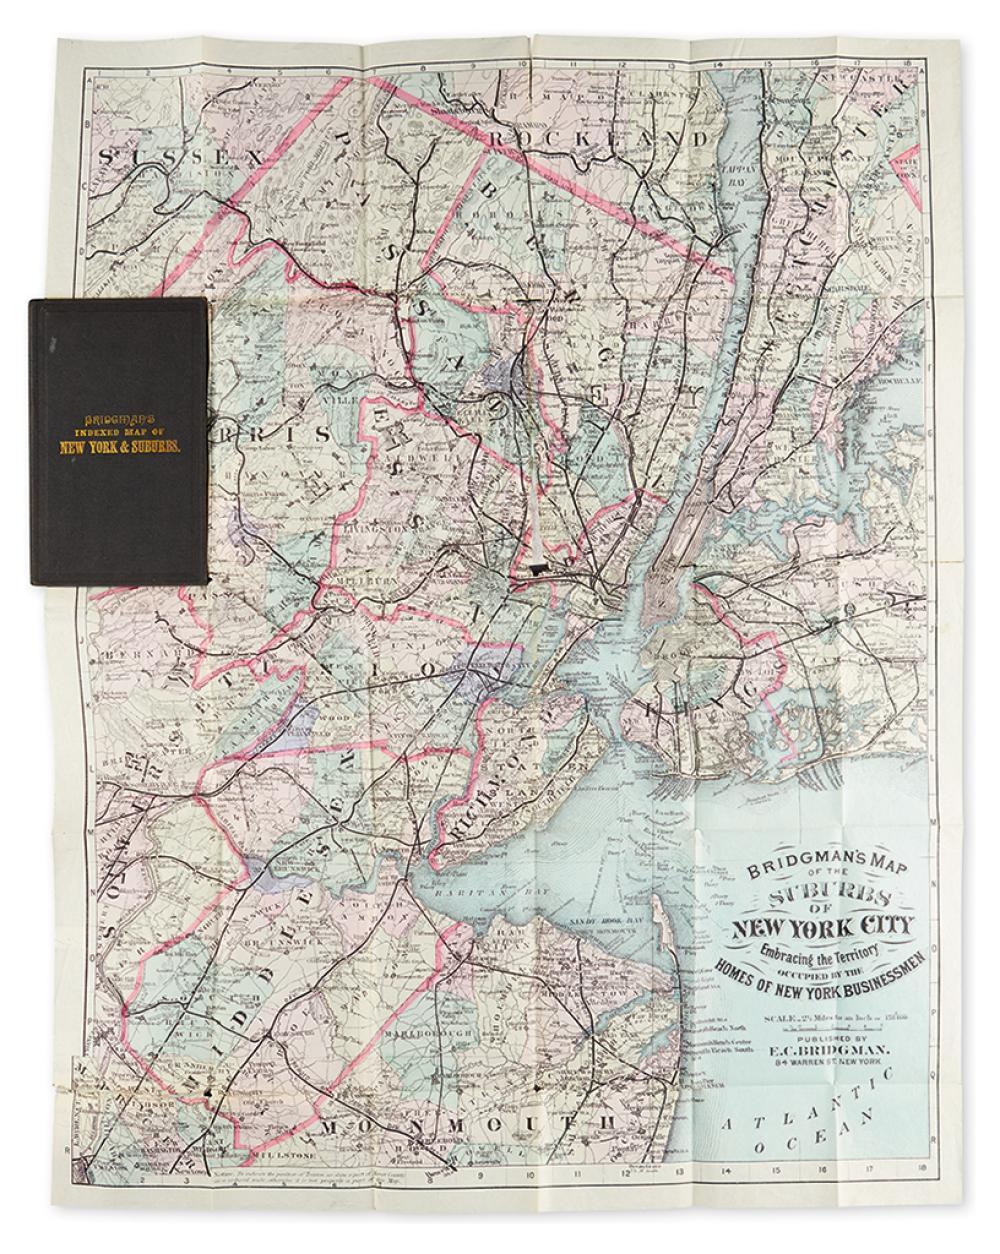 (NEW YORK.) Bridgman, E. C. Bridgman''s Map of the Suburbs of New York City